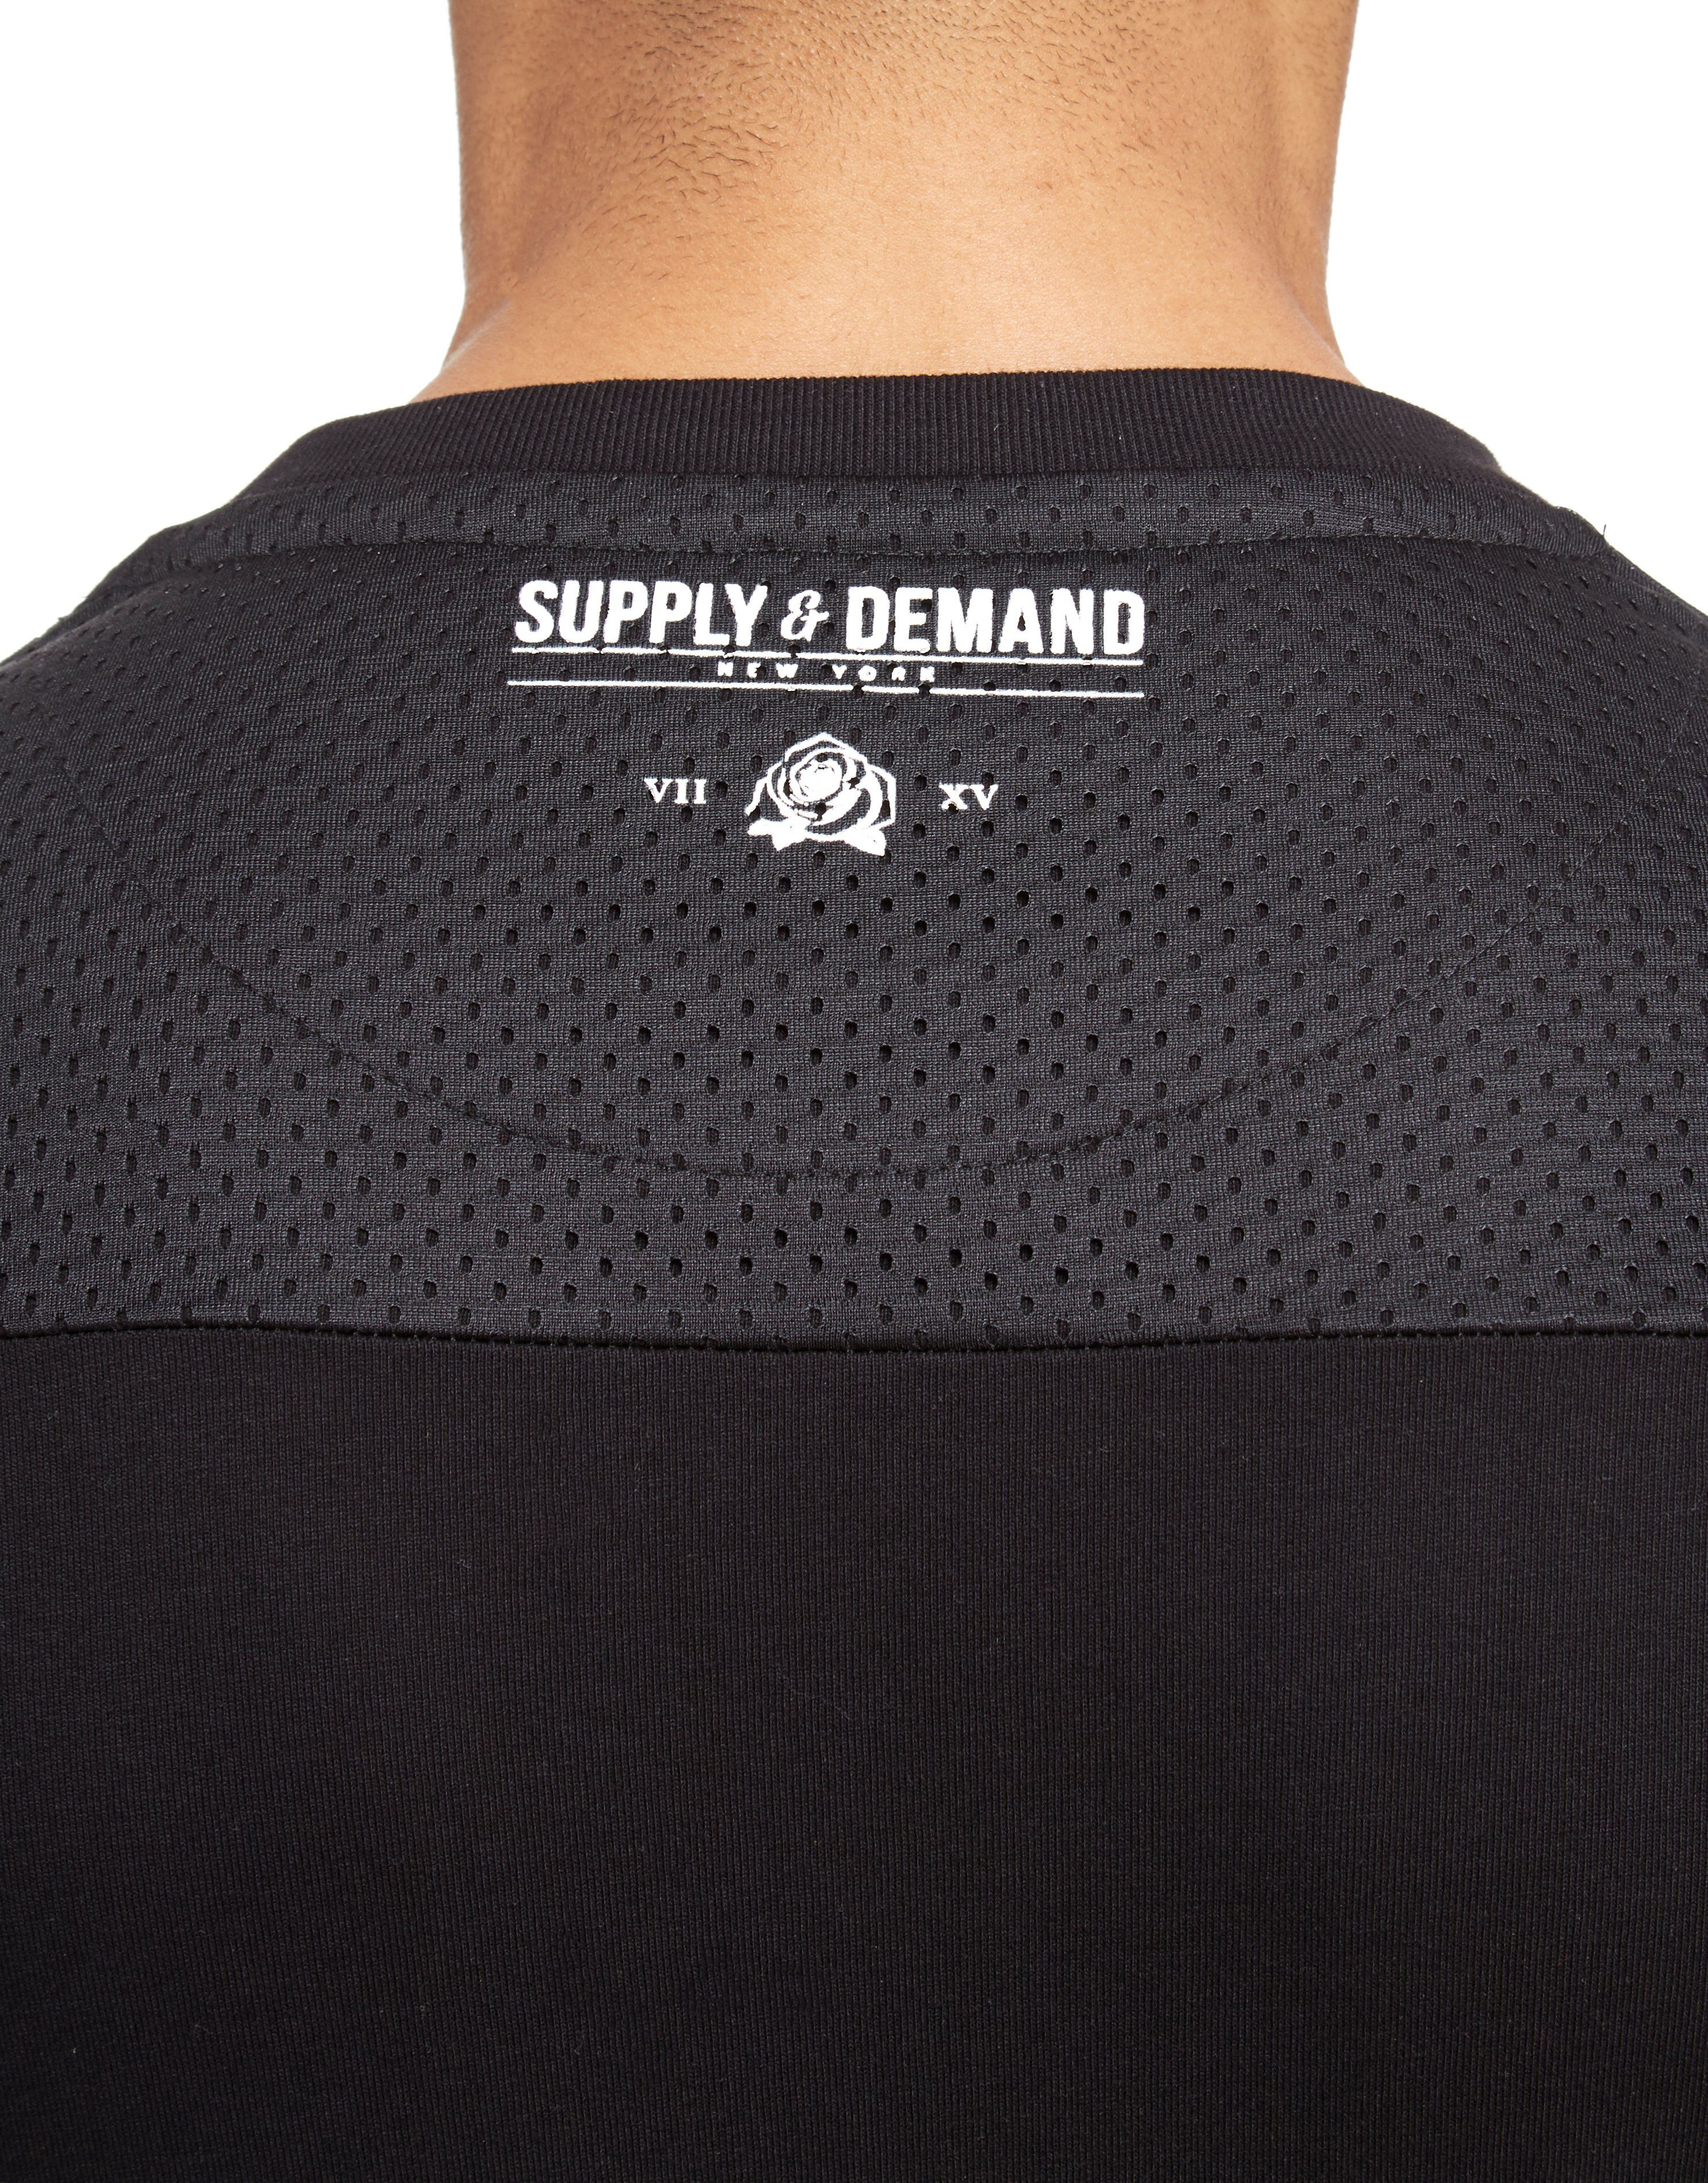 Supply & Demand Motor Long-Sleeved T-Shirt